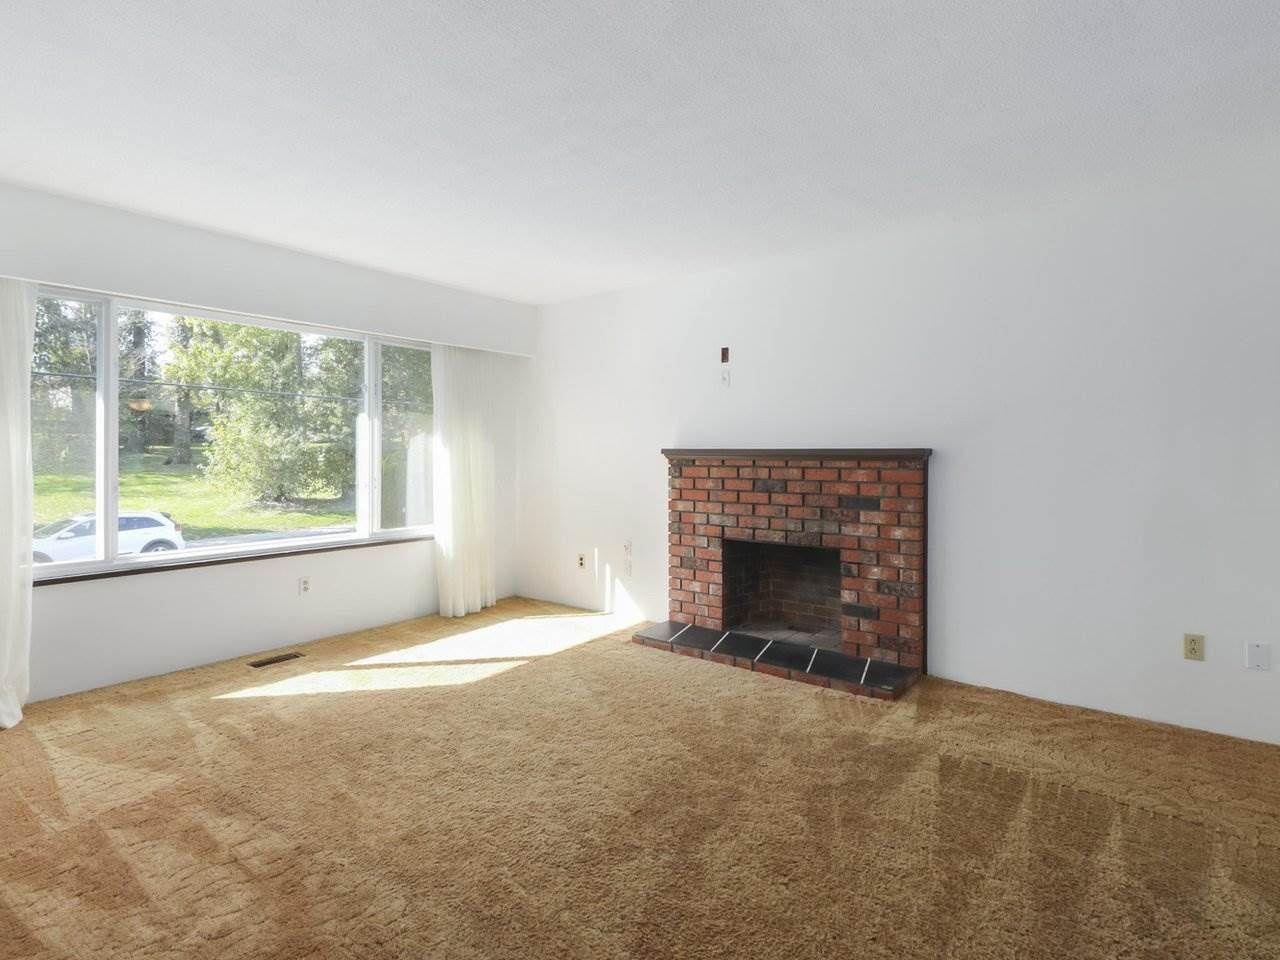 Photo 3: Photos: 1426 KENT Street: White Rock House for sale (South Surrey White Rock)  : MLS®# R2406738